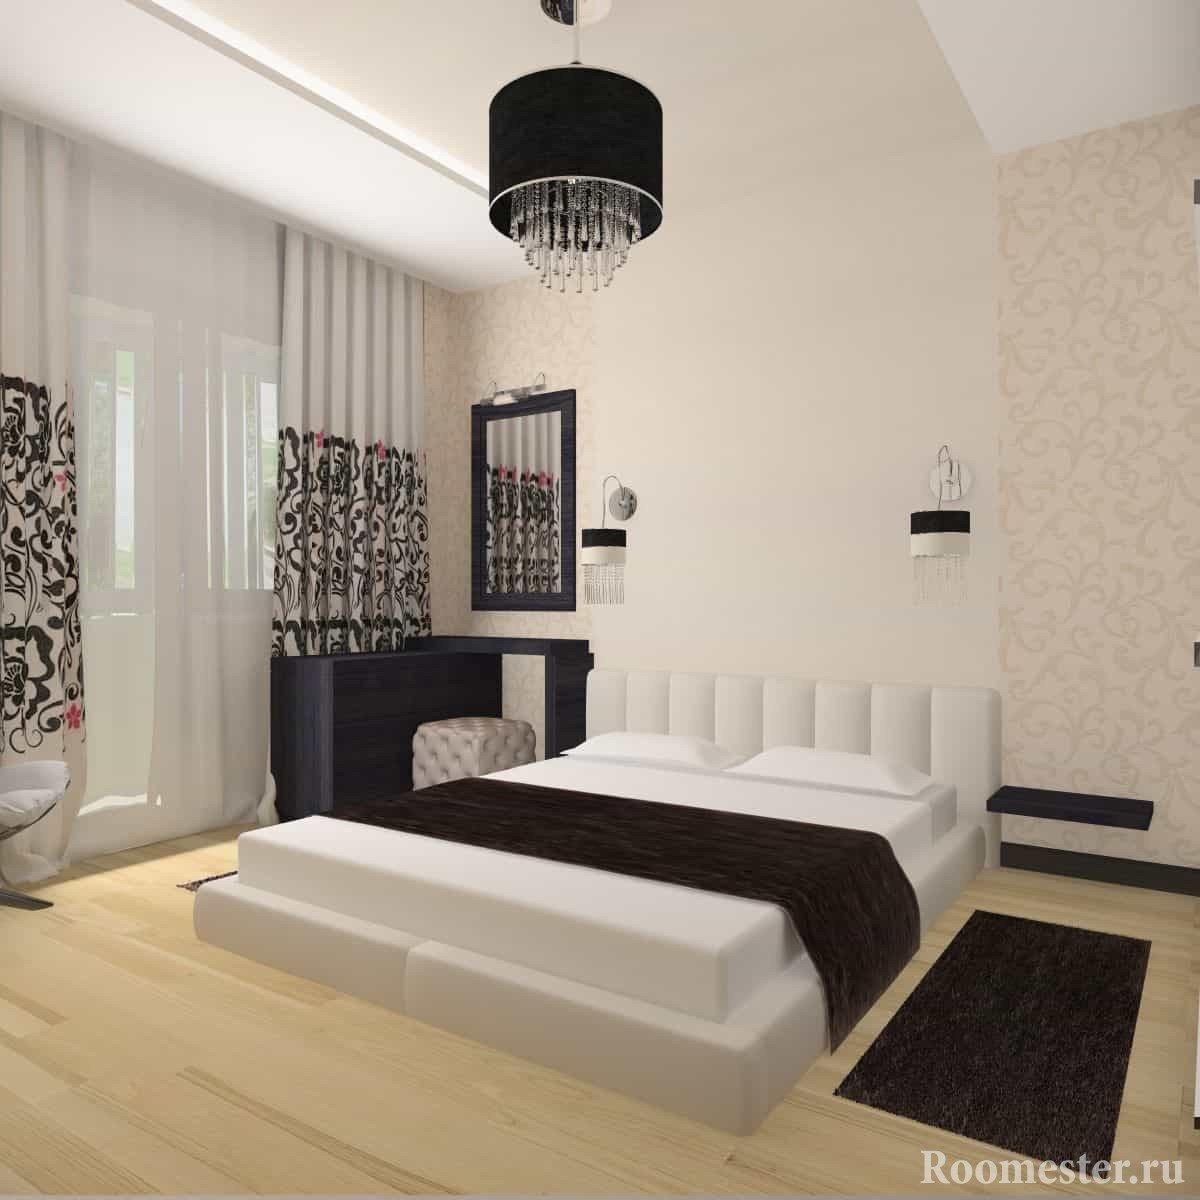 Дизайн-проект спальни 4 на 4 метра